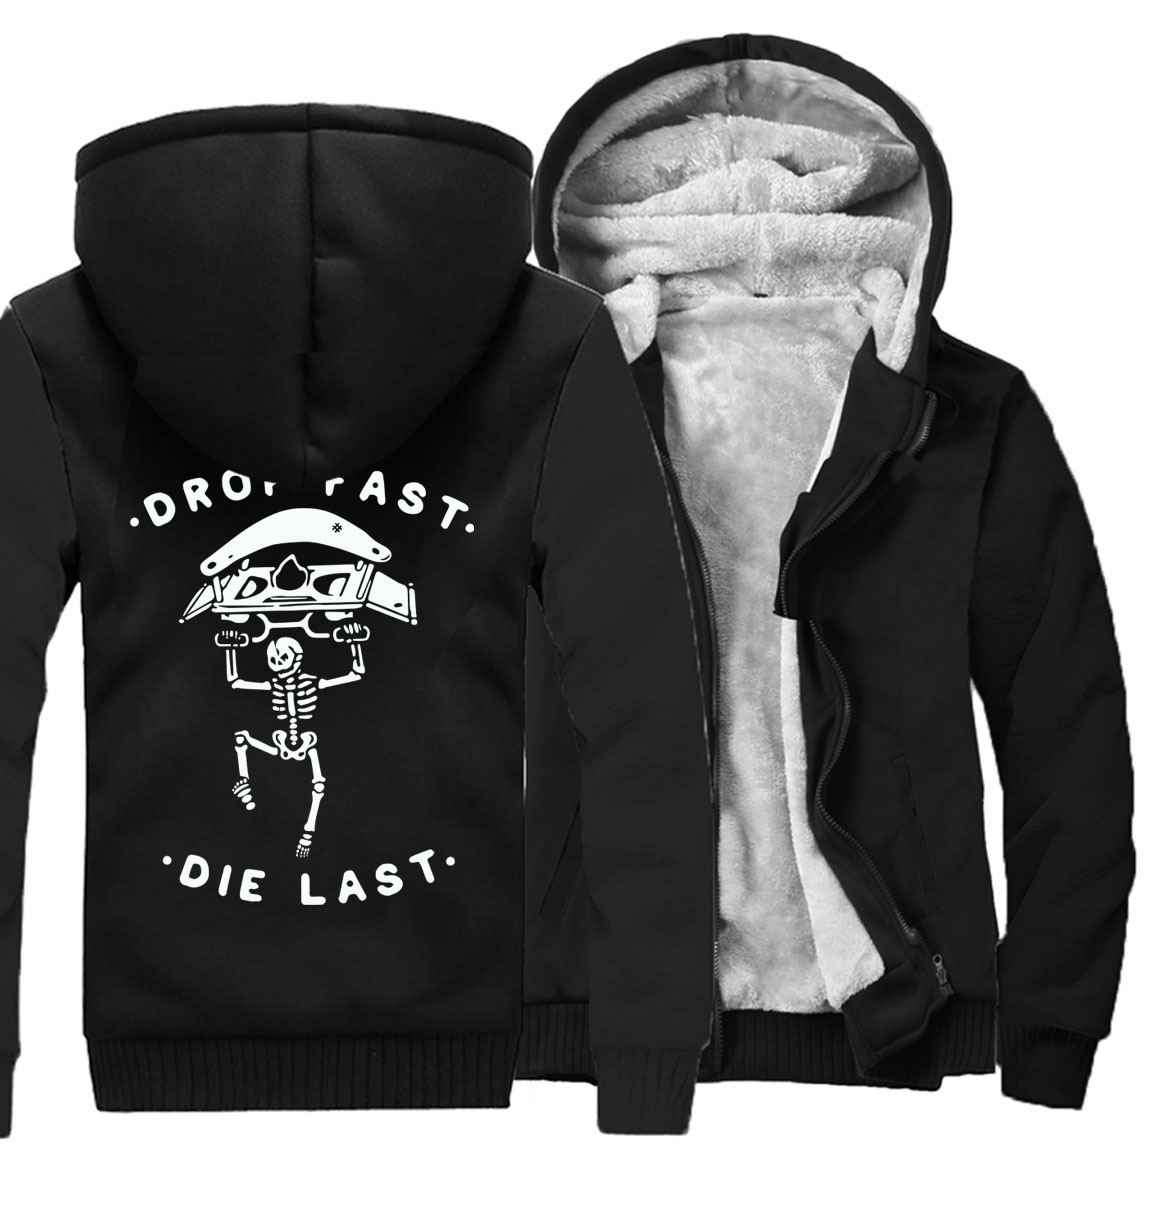 sweatshirt Streetwear Hip hop men Game jackets funny drop fast die last letter print full sleeve thick tracksuit 2019 winter